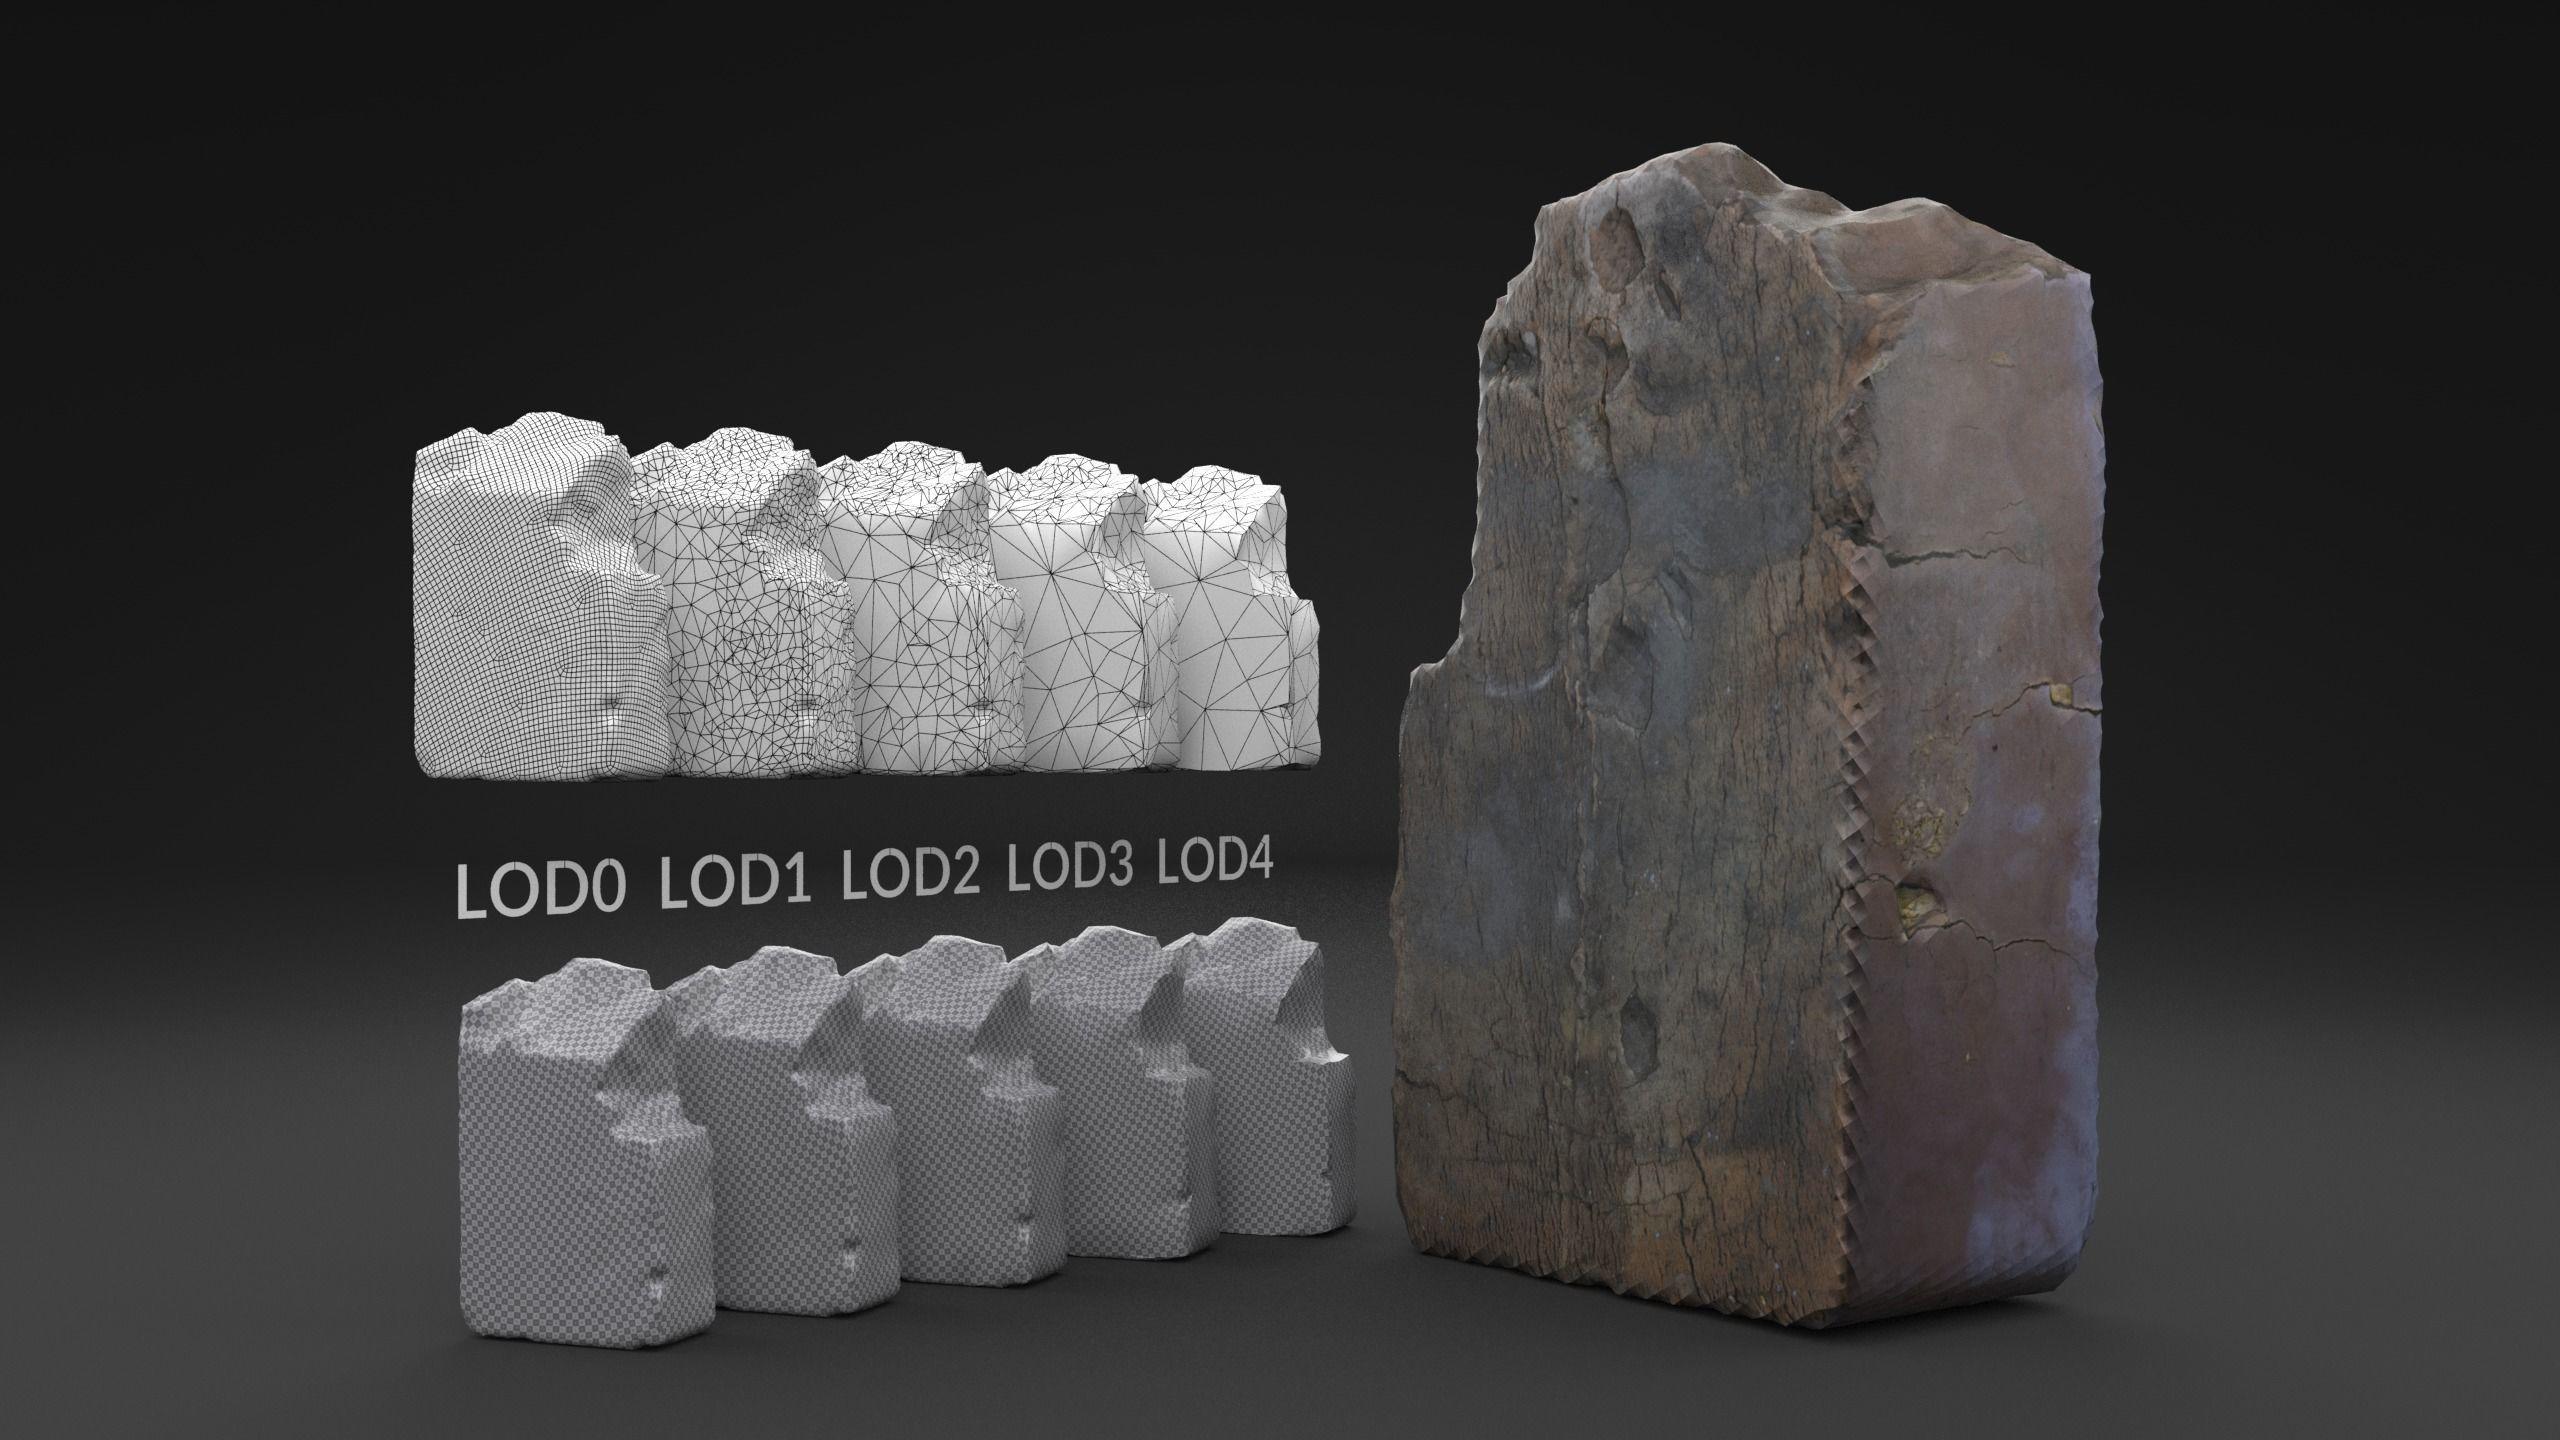 Scanned Broken Red Ceramic Brick LOW POLY LODs